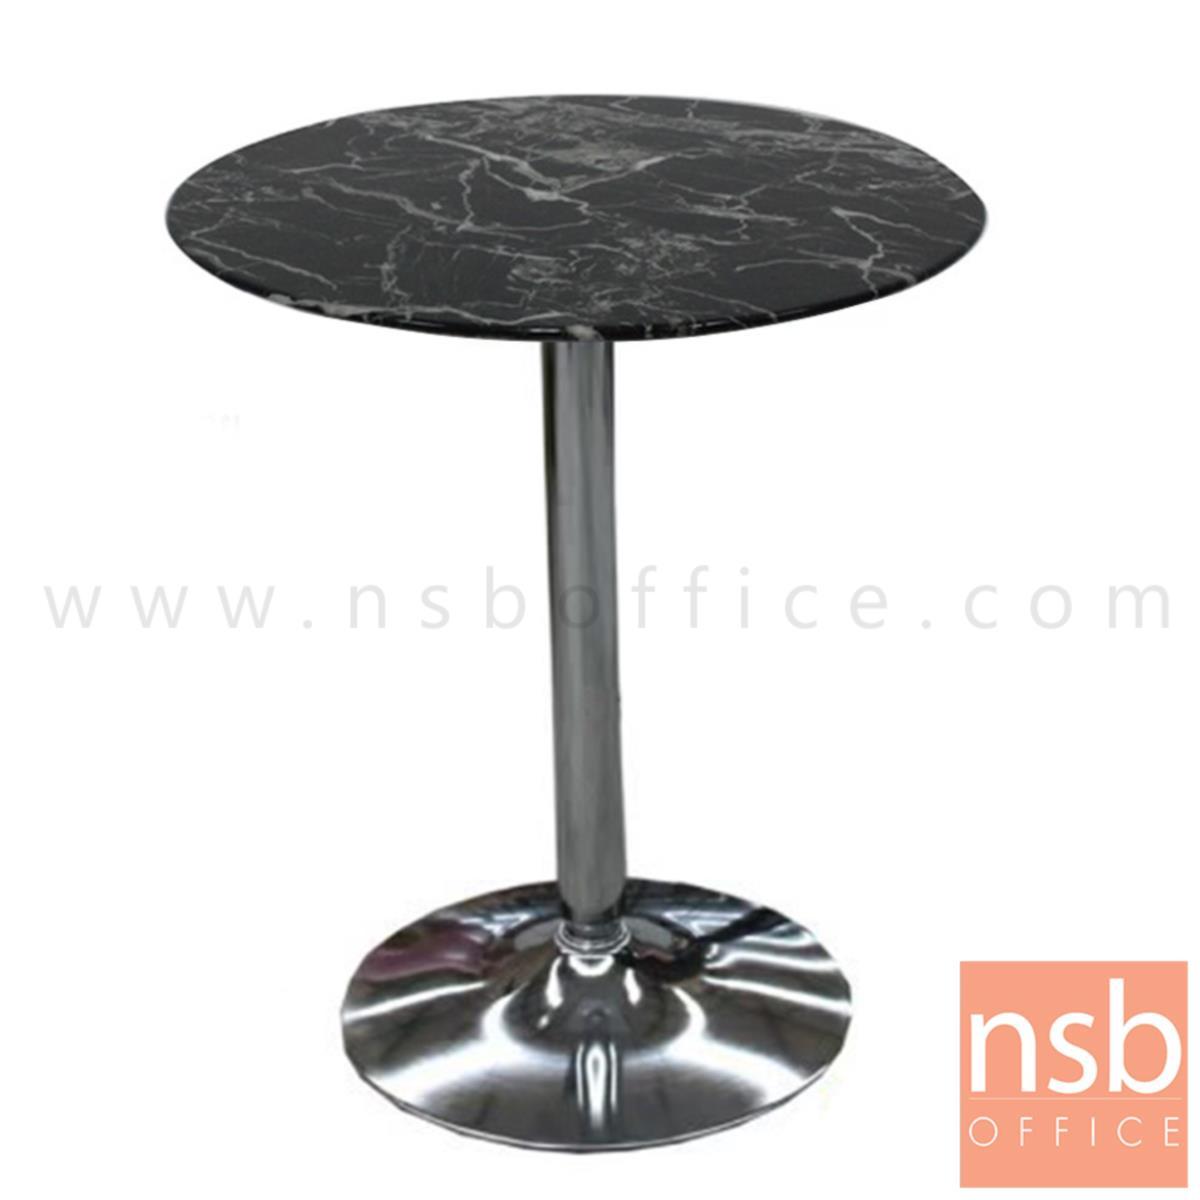 A14A274:โต๊ะบาร์กลมหน้าท็อปหิน รุ่น Mikhail (มิคาอิล)  ขาเหล็ก